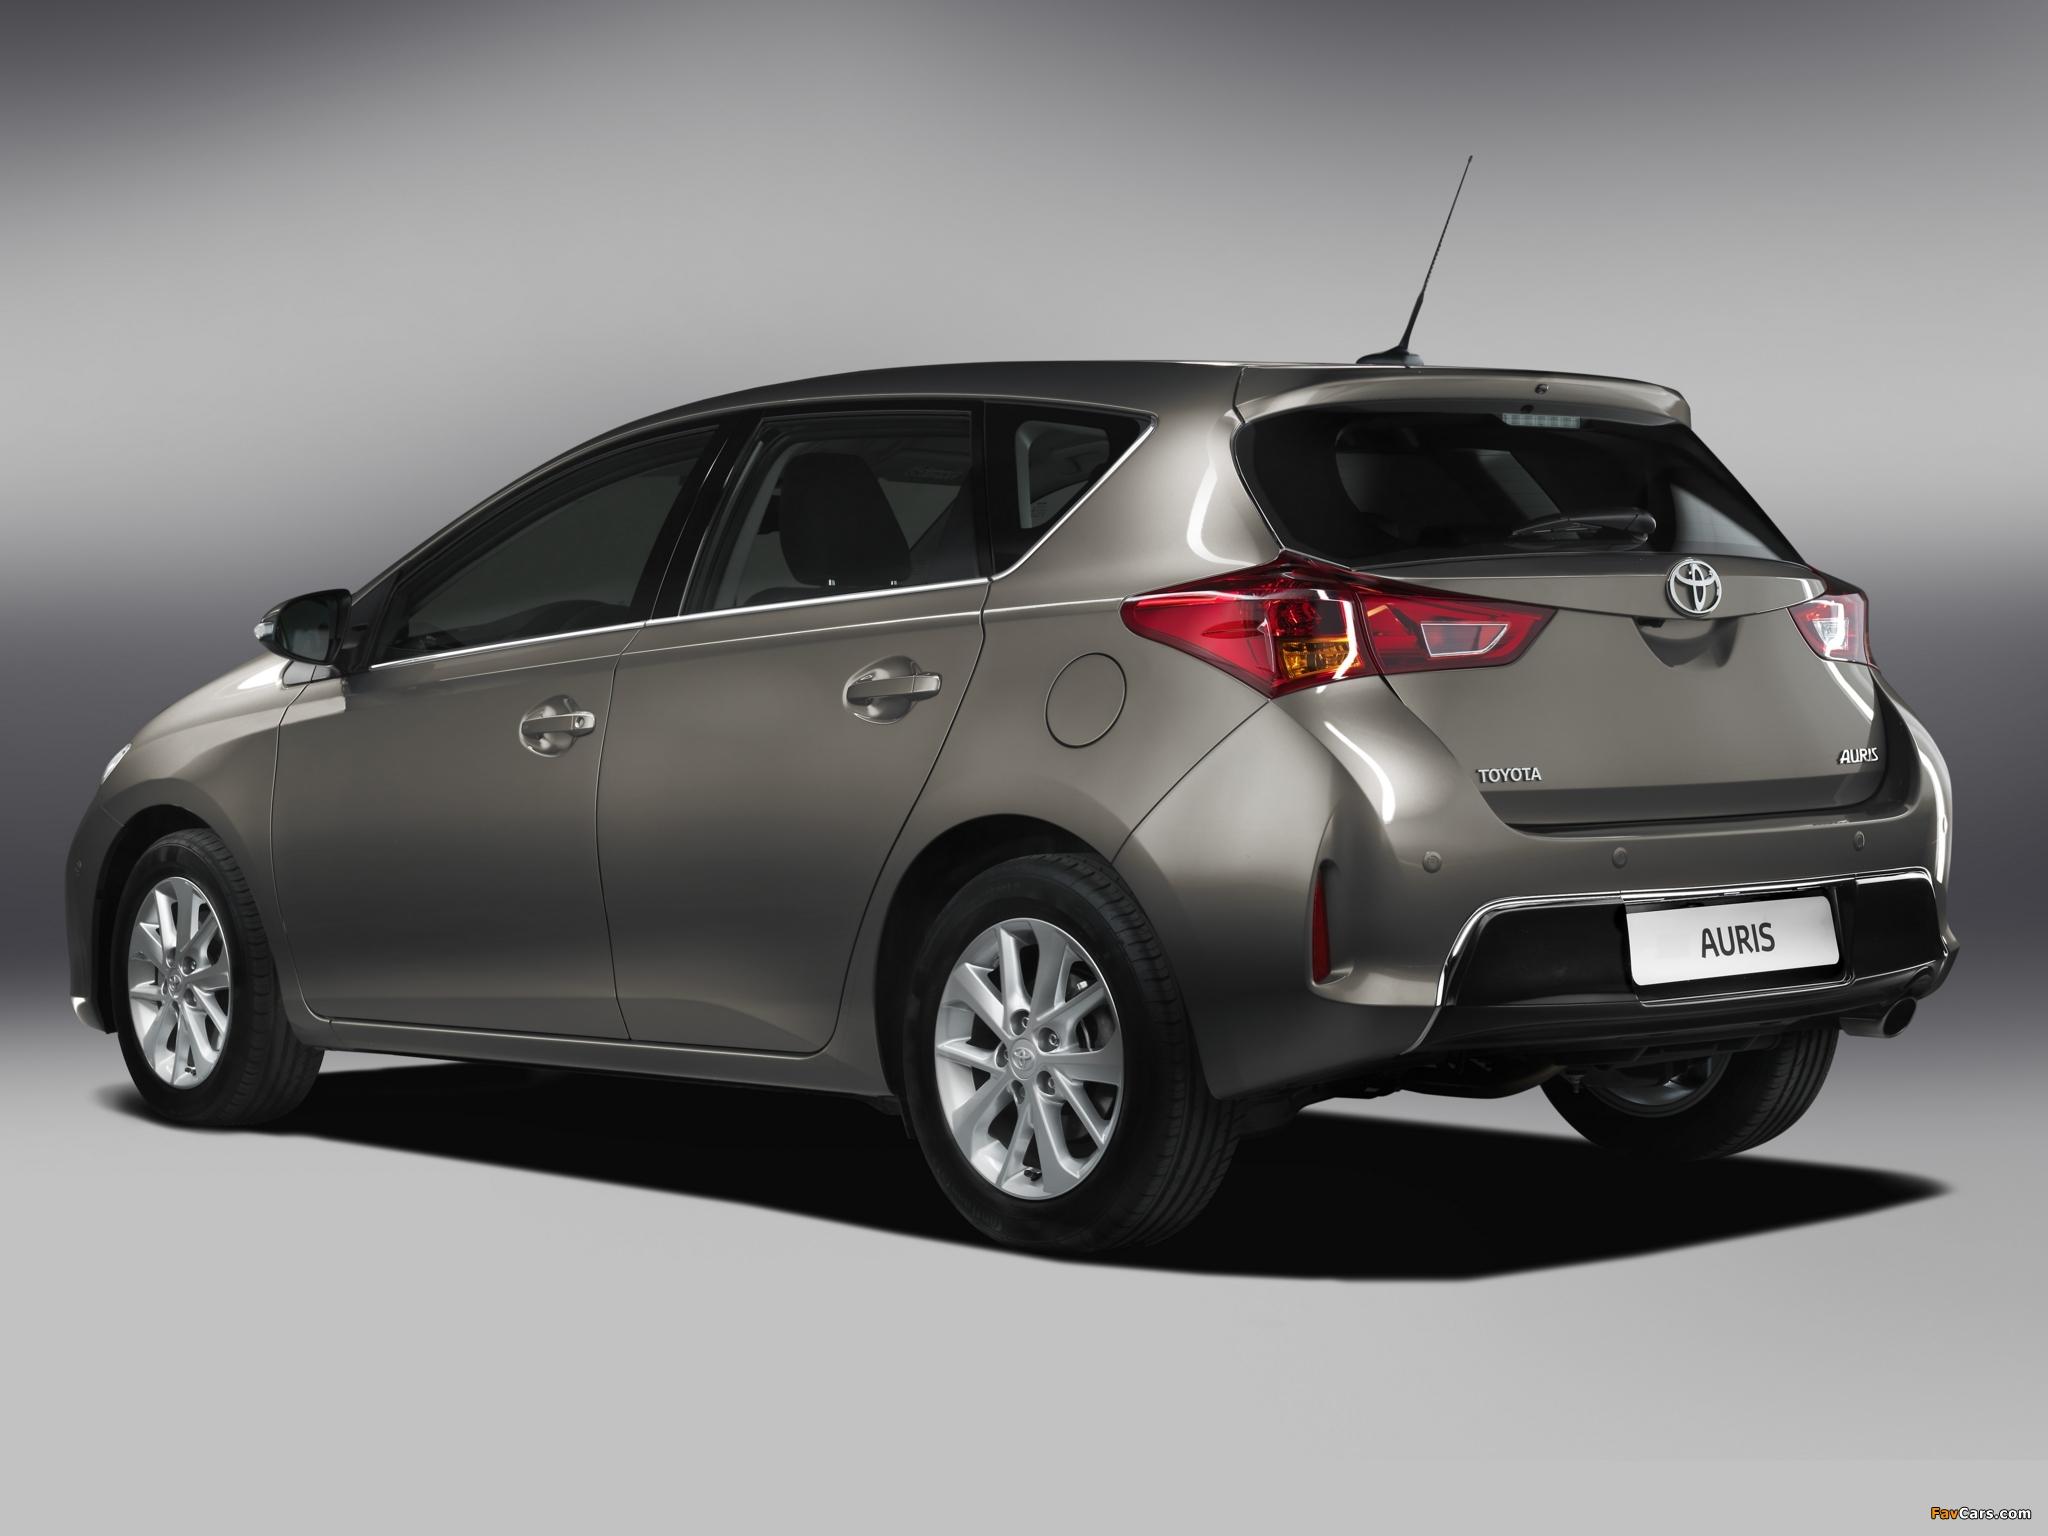 Toyota Auris 2012 pictures (2048 x 1536)